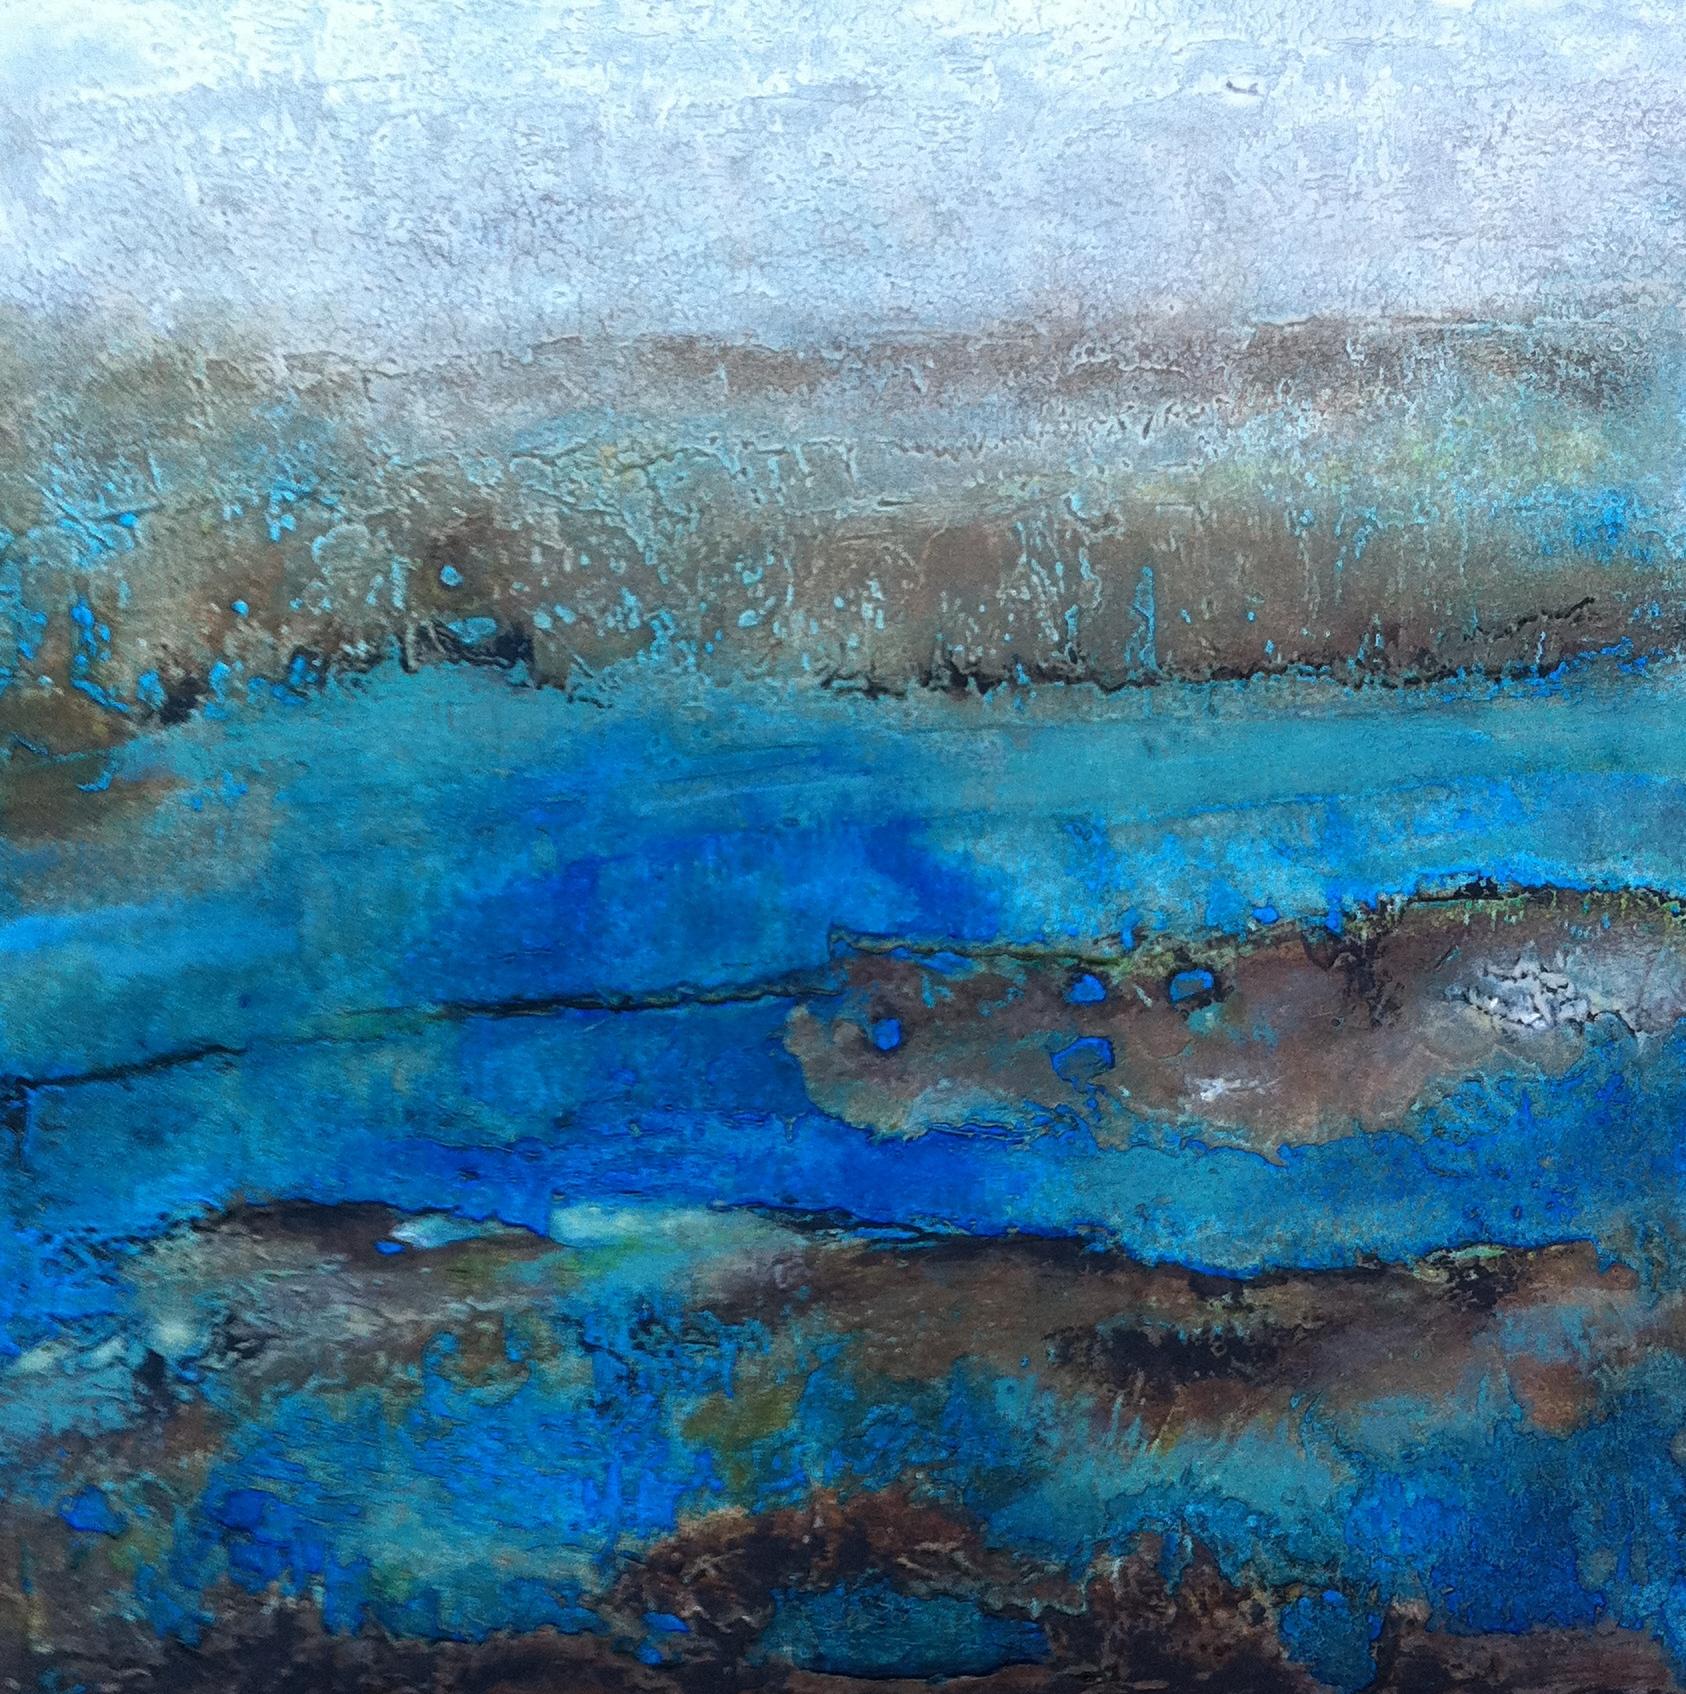 Ocean Denman IV, 2x2 ft, acrylic.